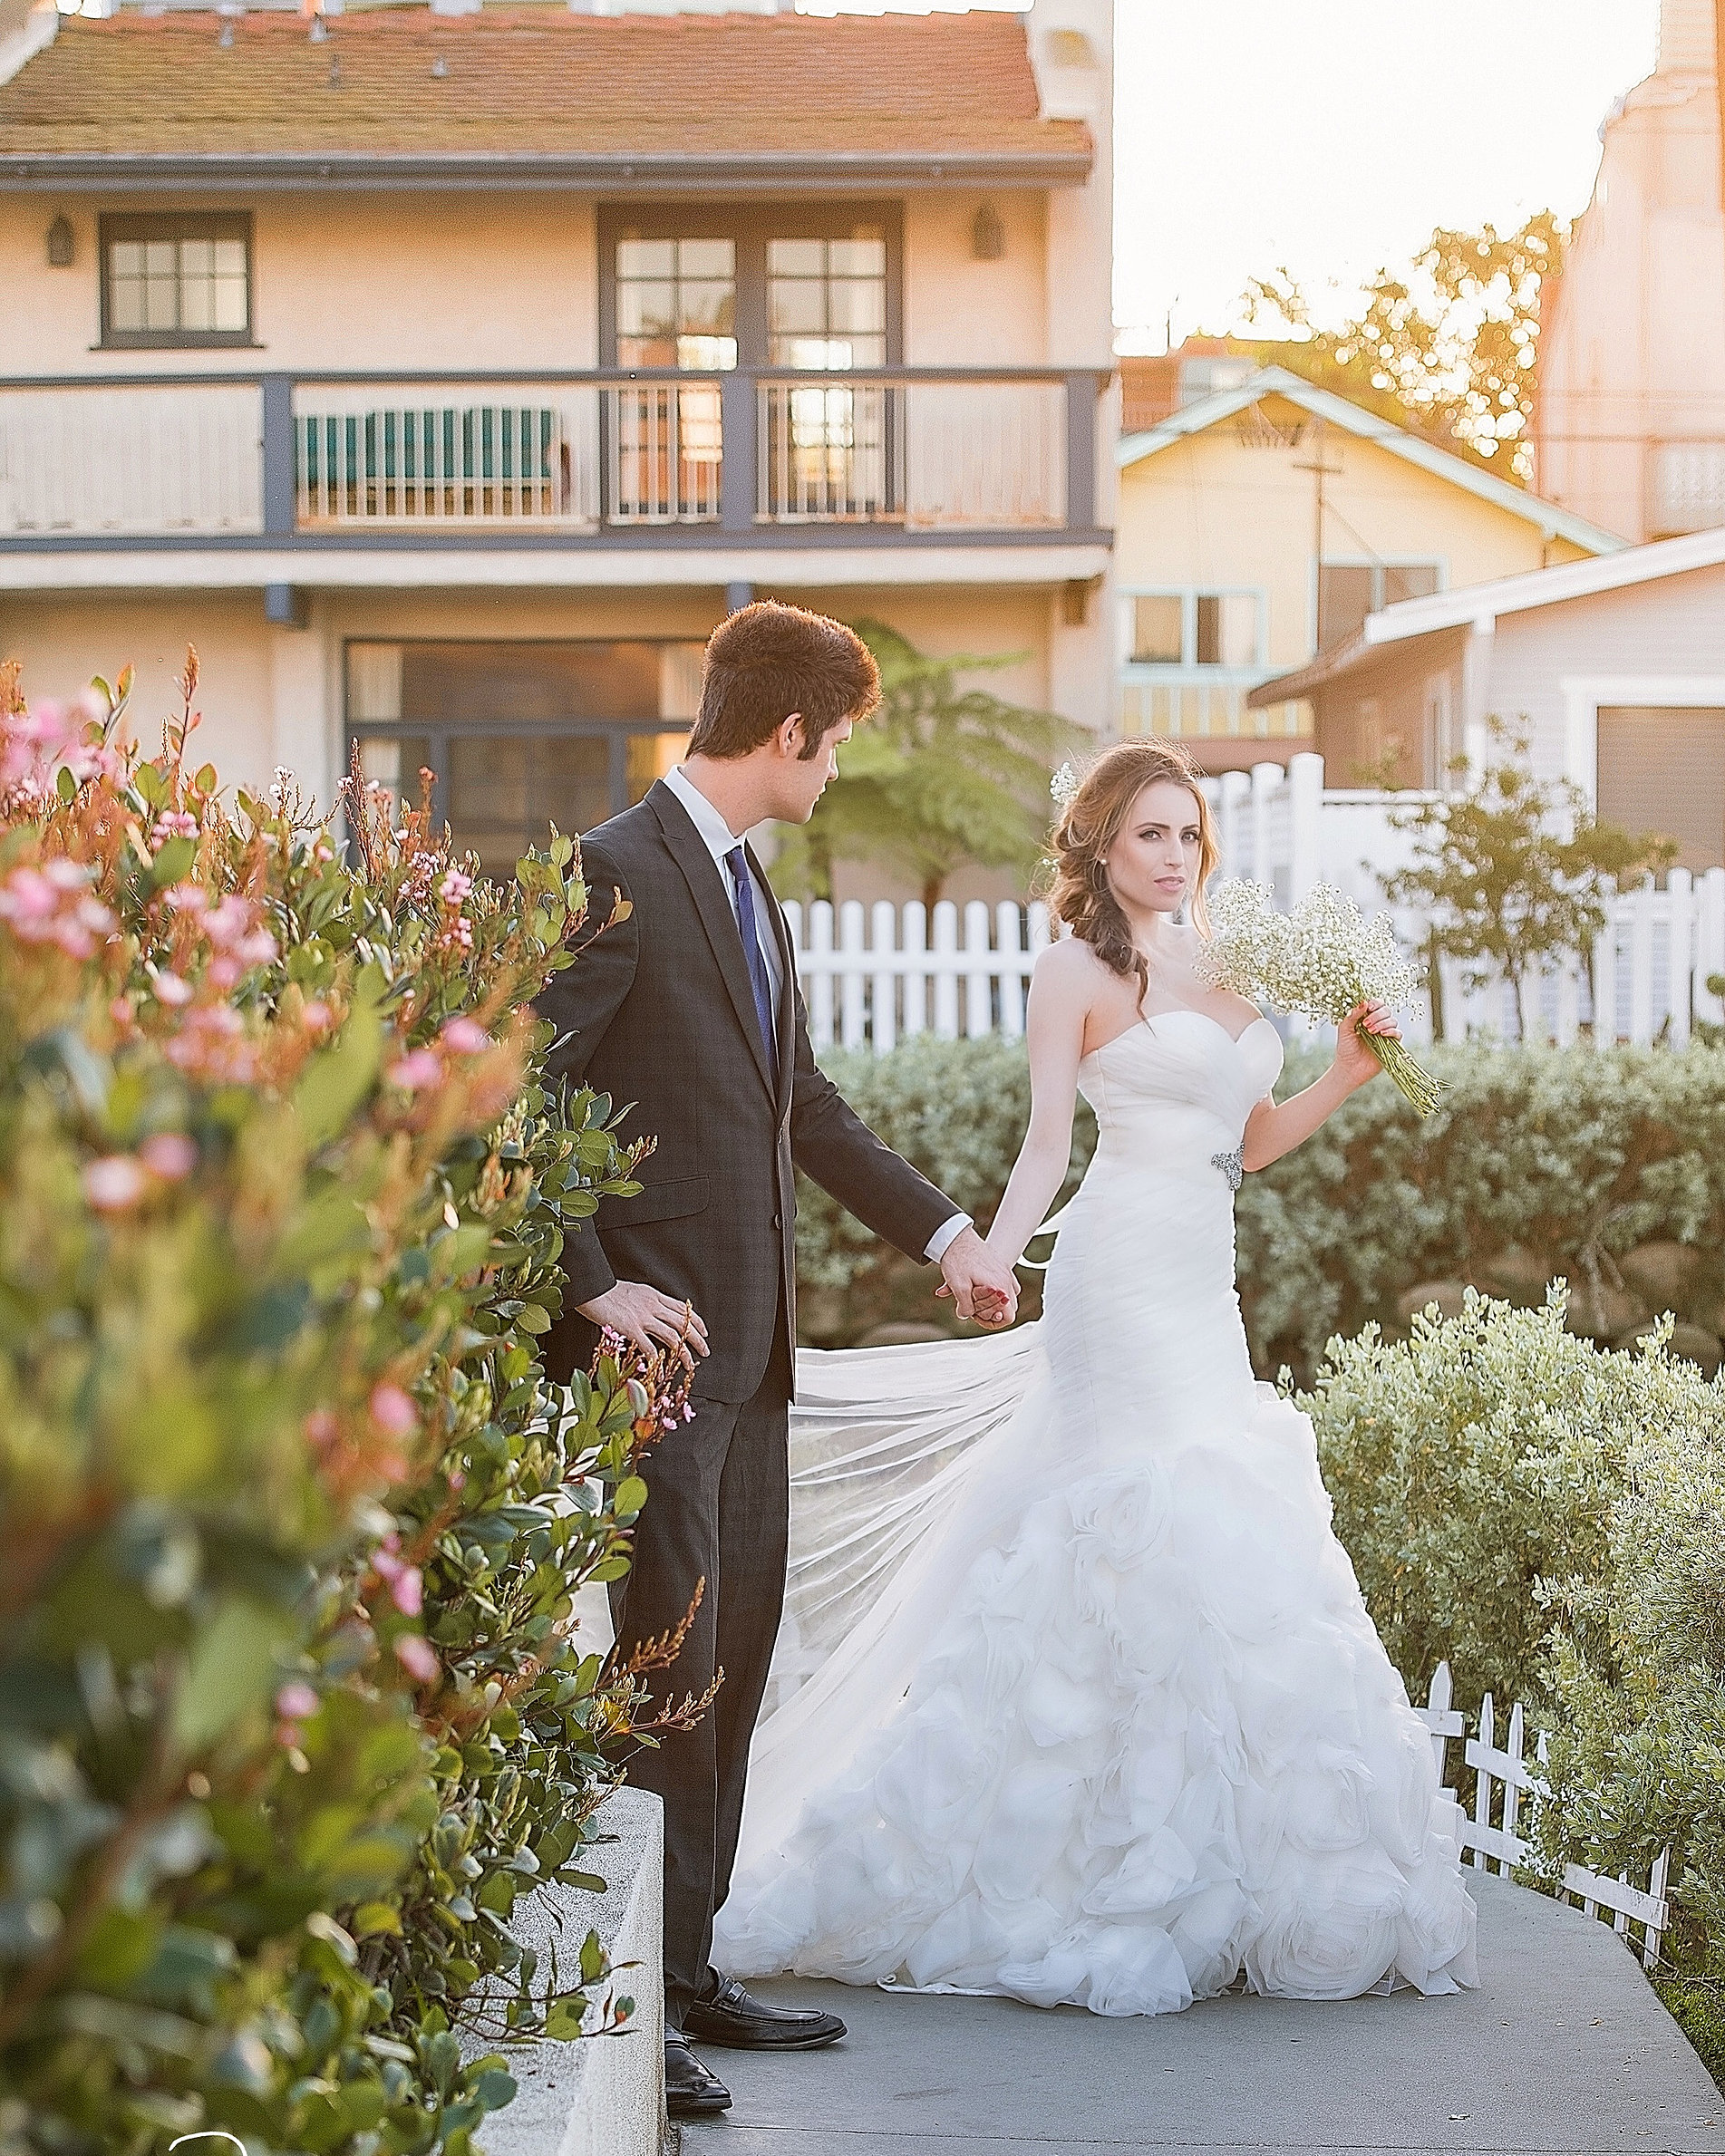 lz bridal rose mermaid wedding dress